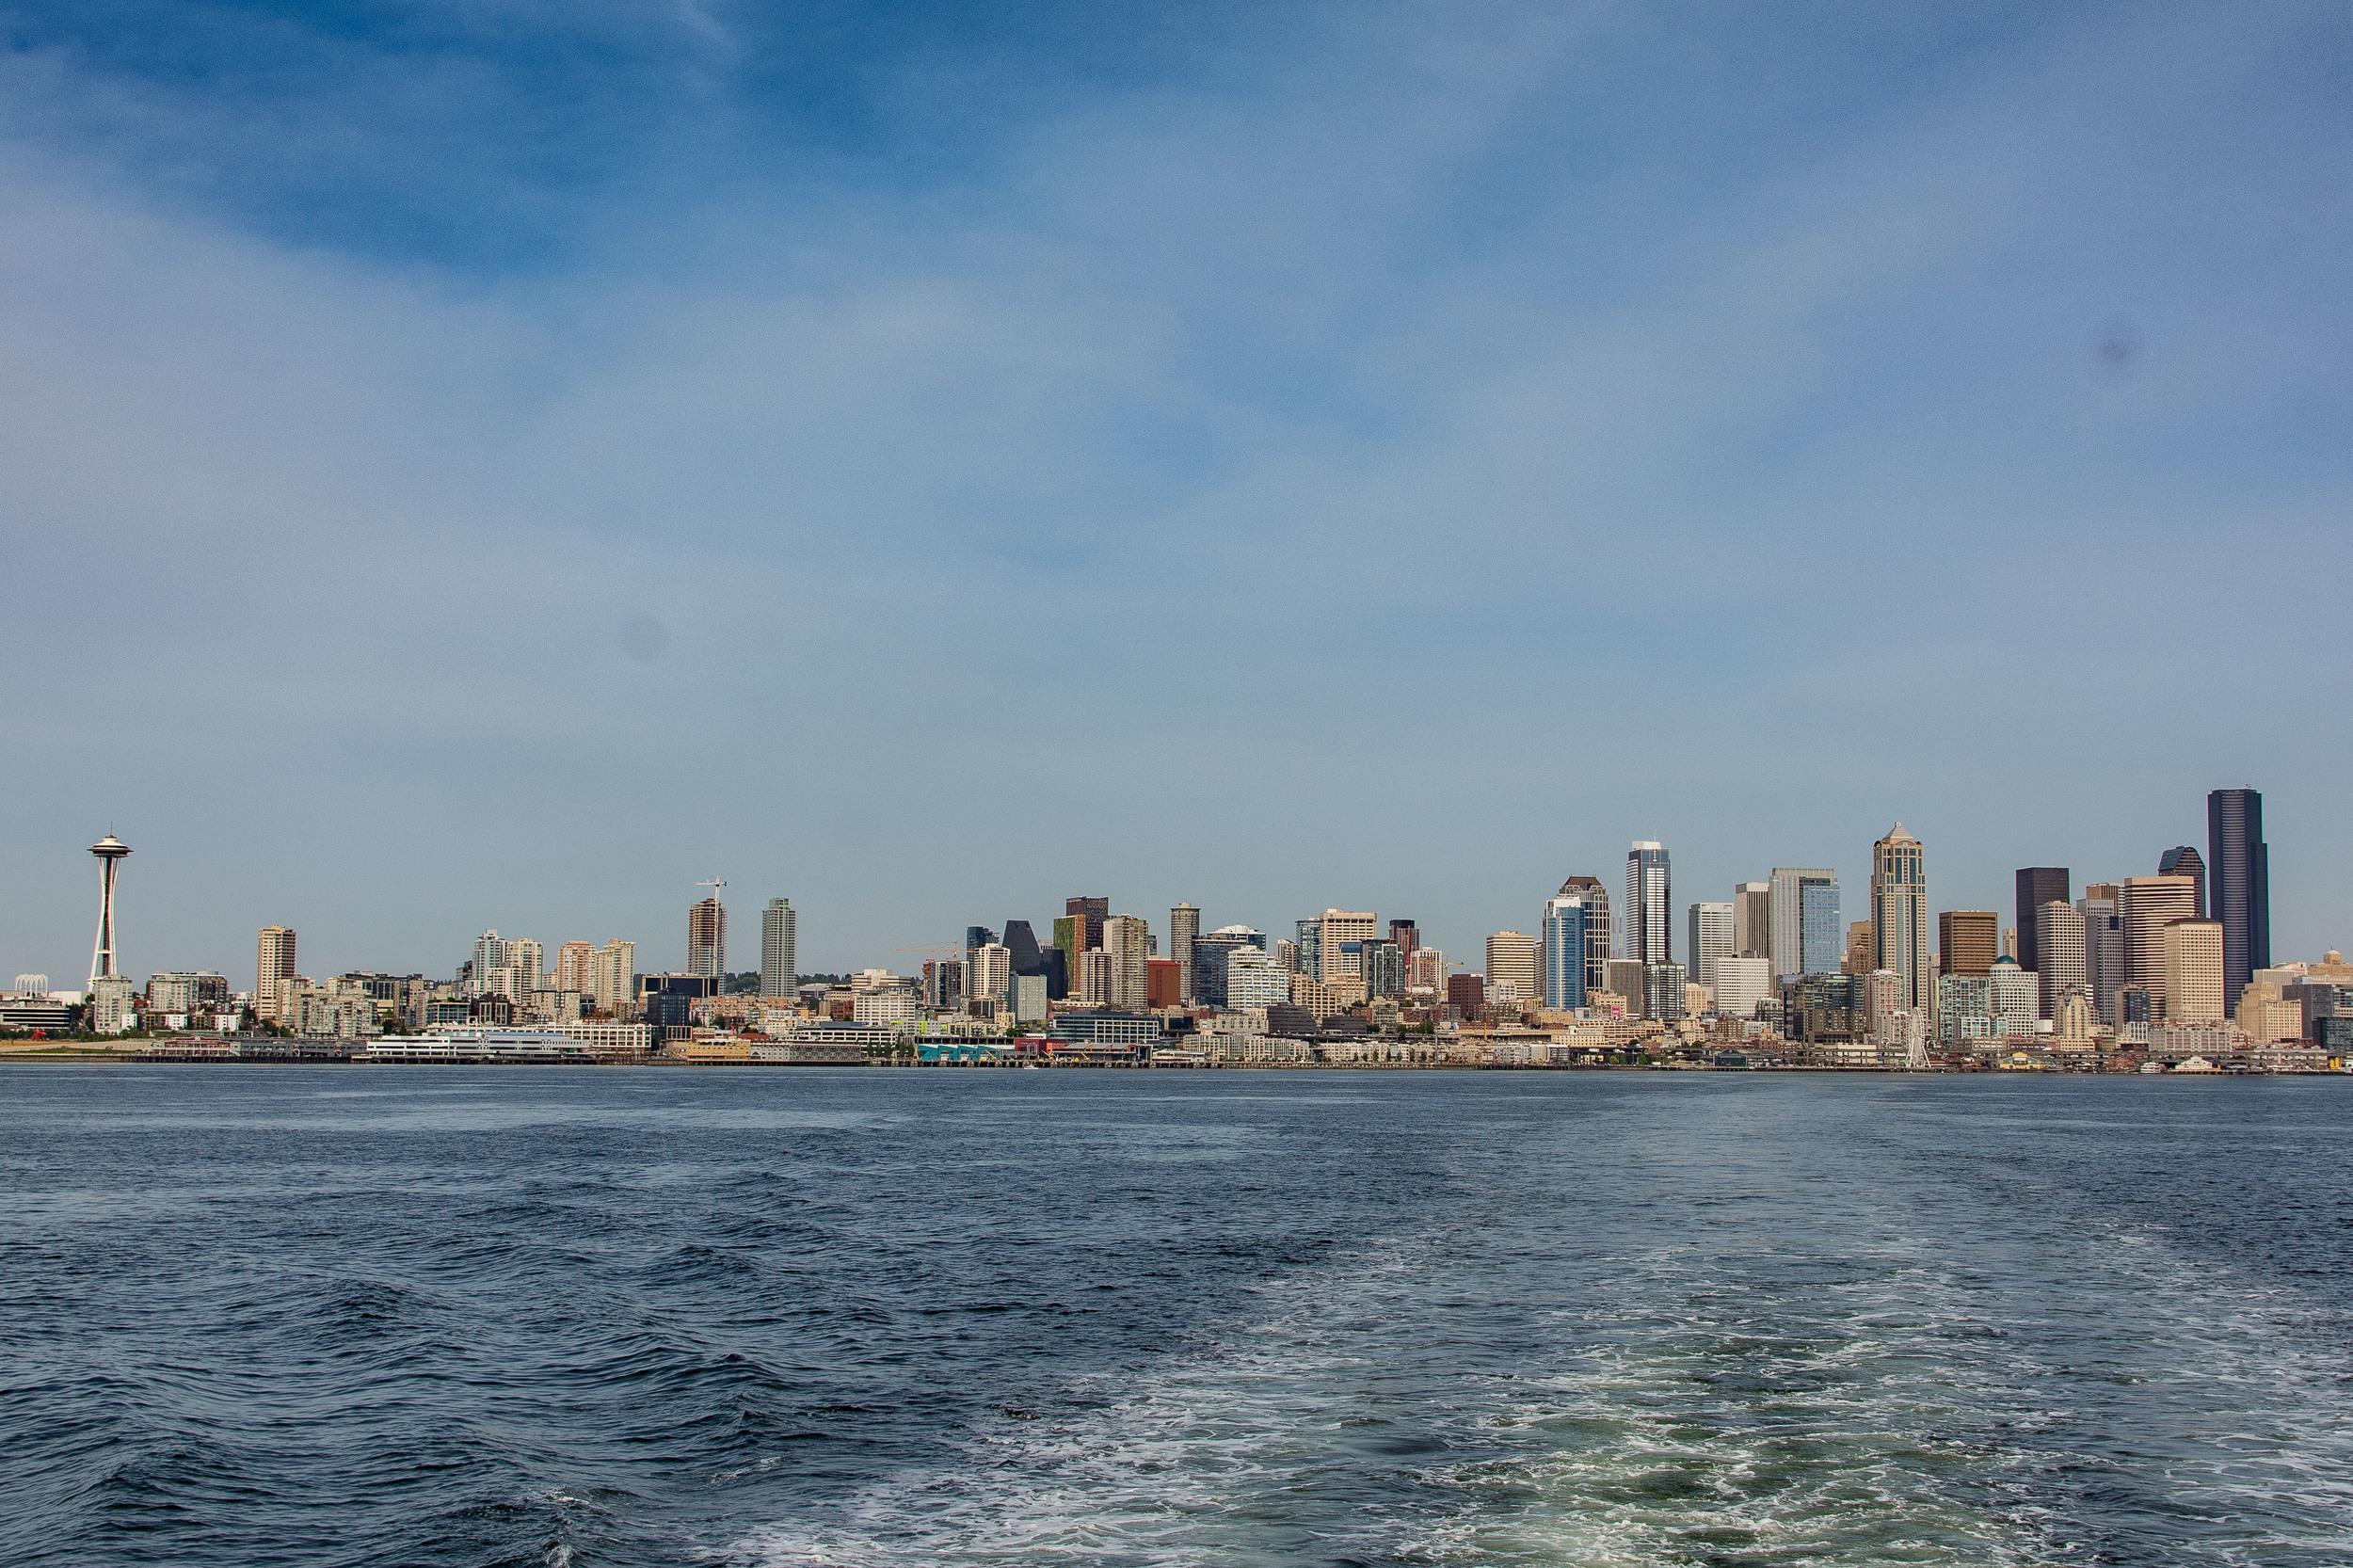 Seattle skyline from Puget Sound.